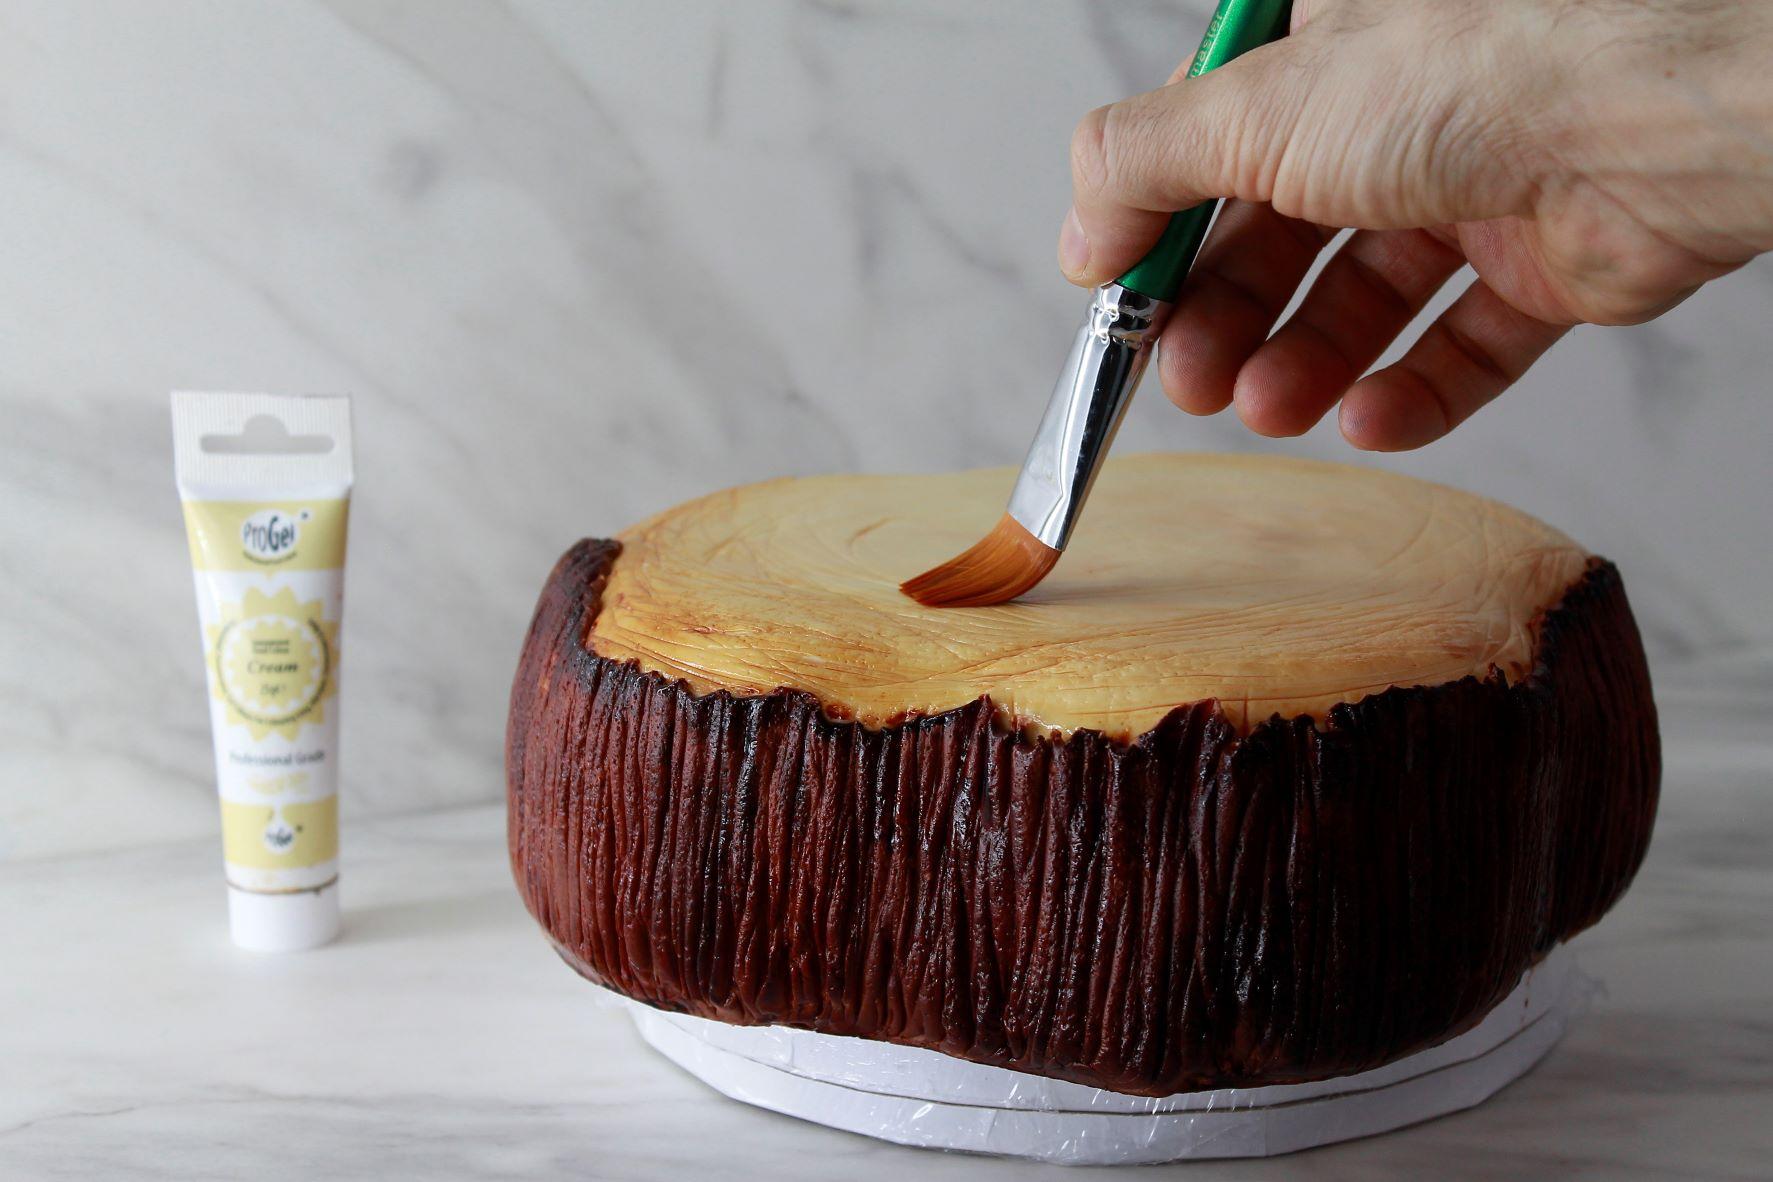 Create a textured wood design